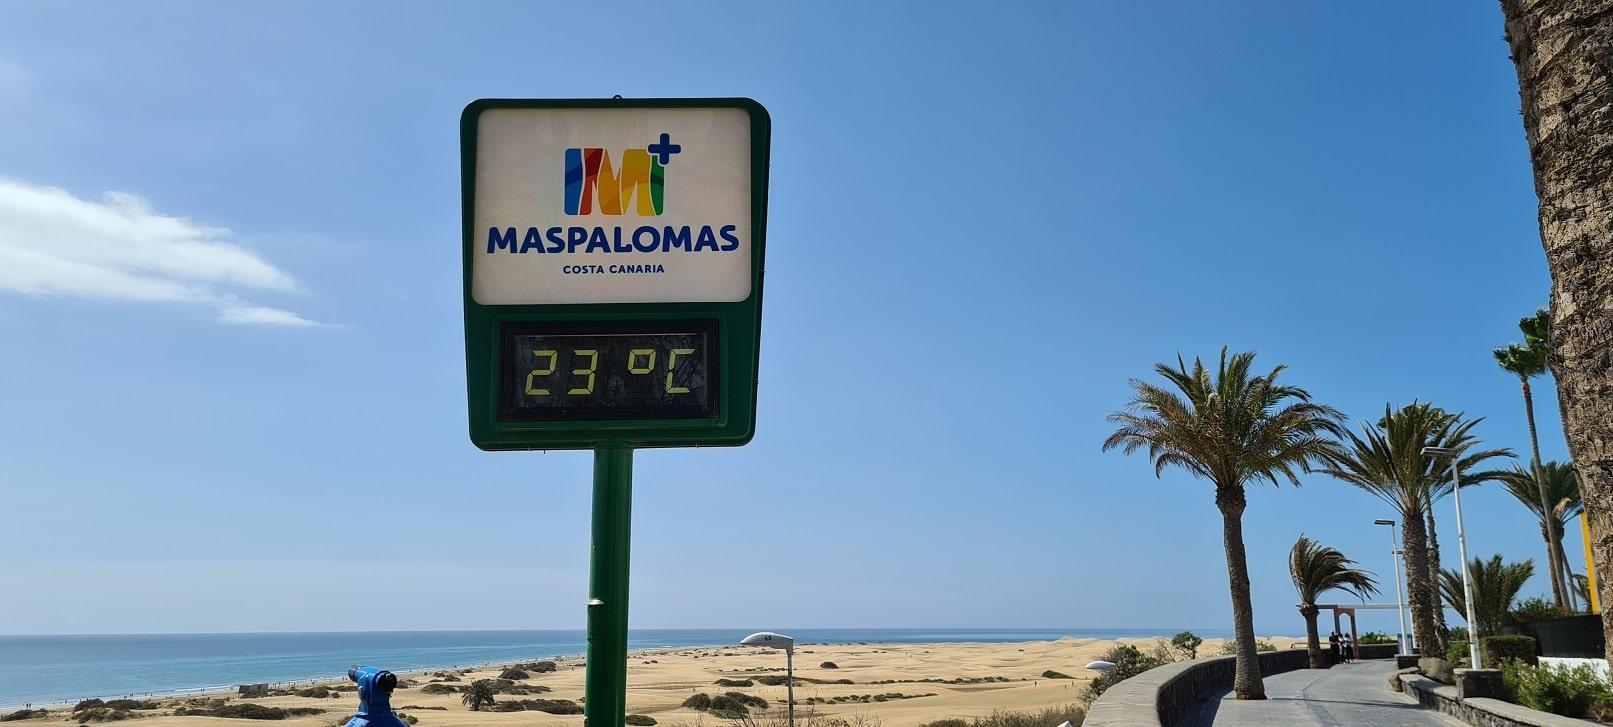 Gran Canaria - 23 Grad Temperatur